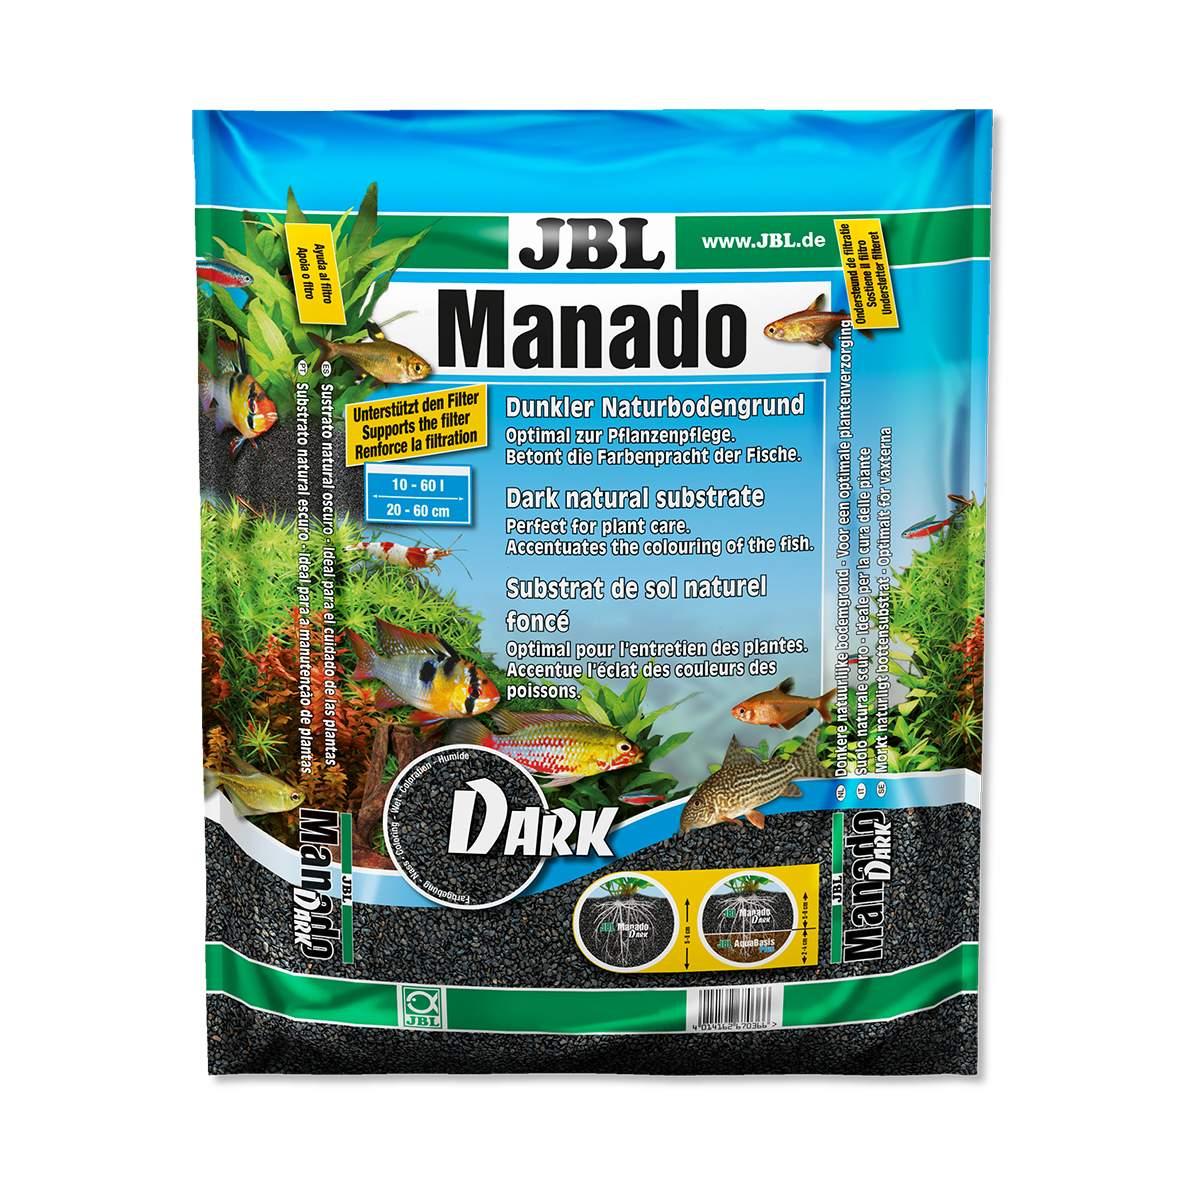 SUBSTRATO NATURAL ESCURO PARA AQUÁRIOS JBL MANADO DARK - 10L